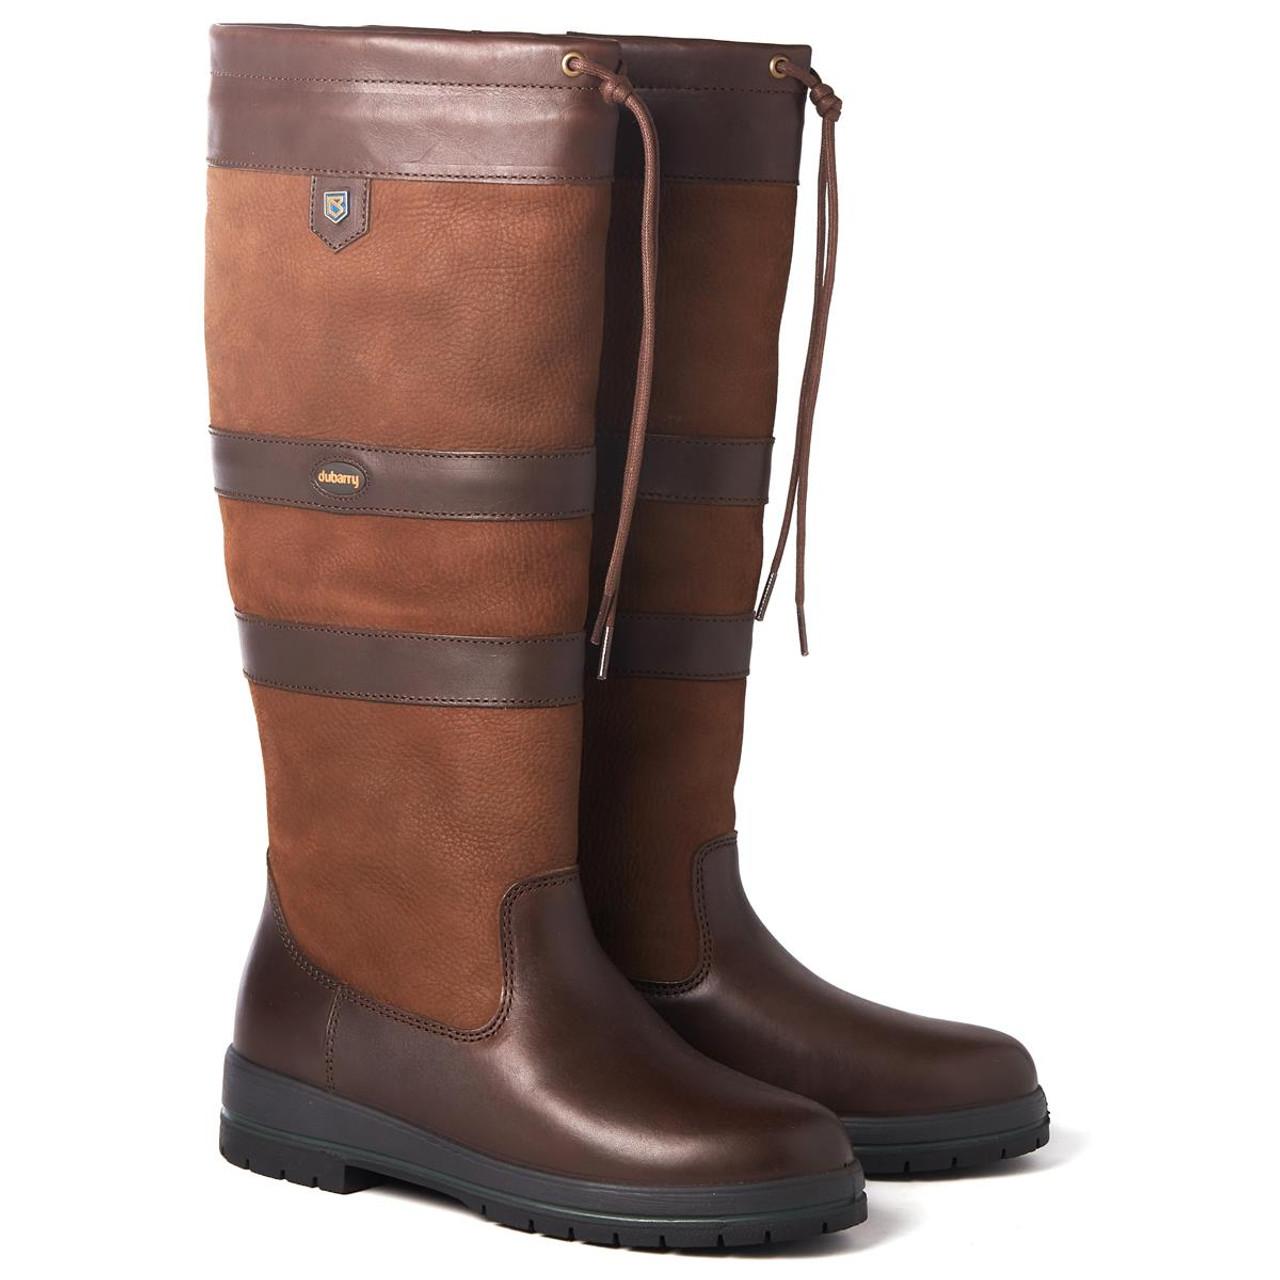 Walnut Galway ExtraFit Boots